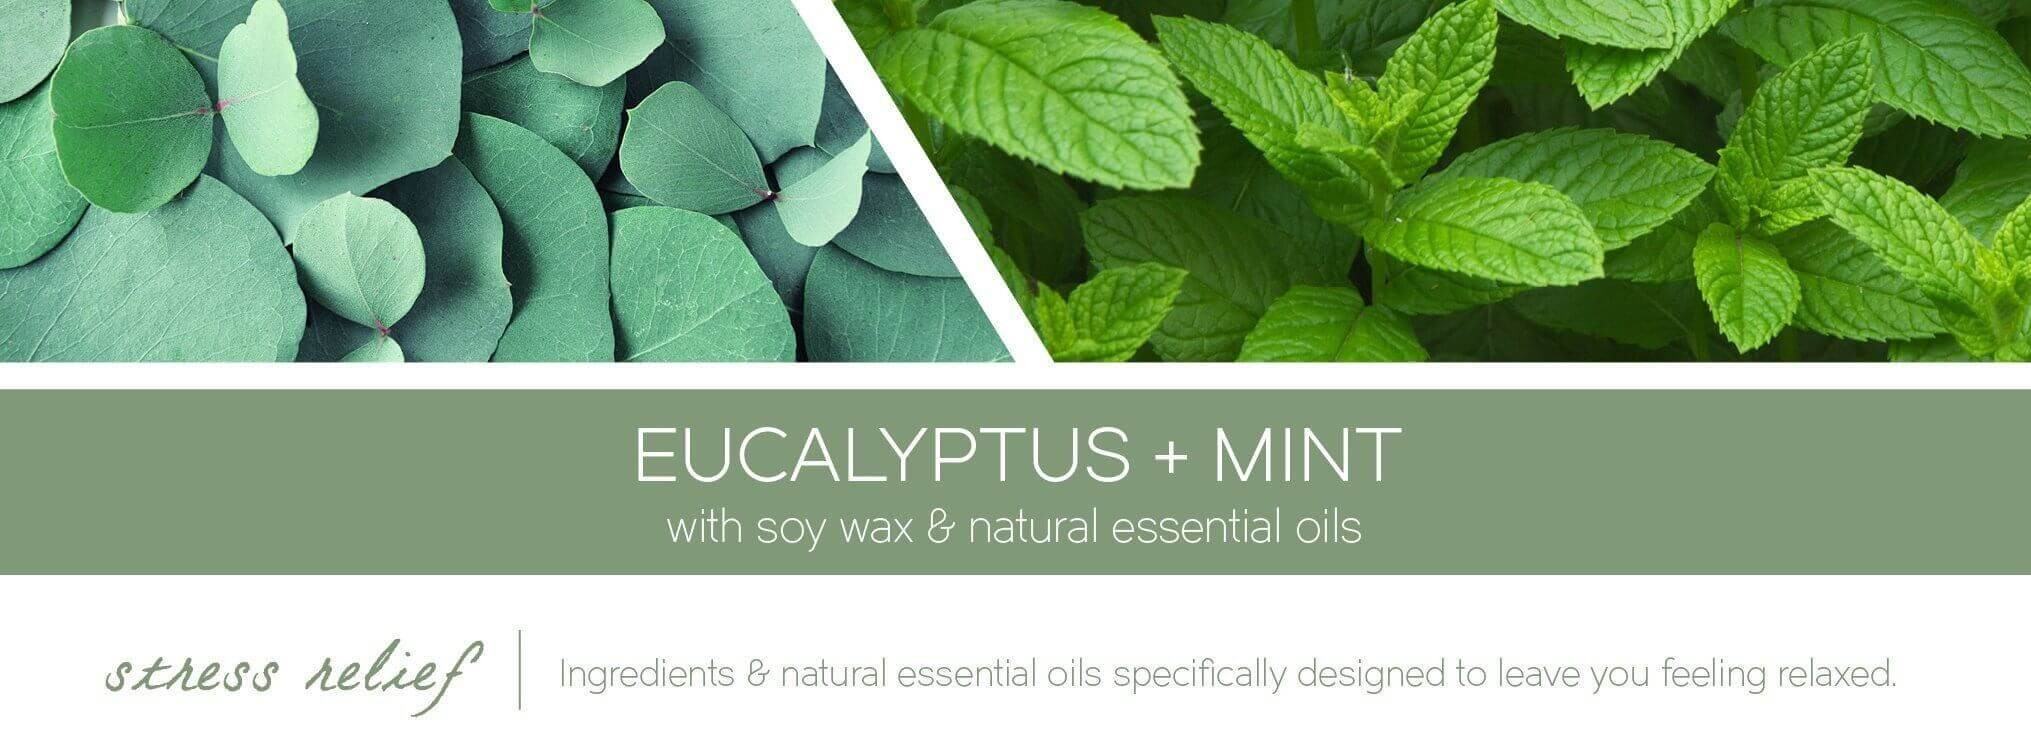 eucalyptus-mint-aromatherapy-candle-fragrance